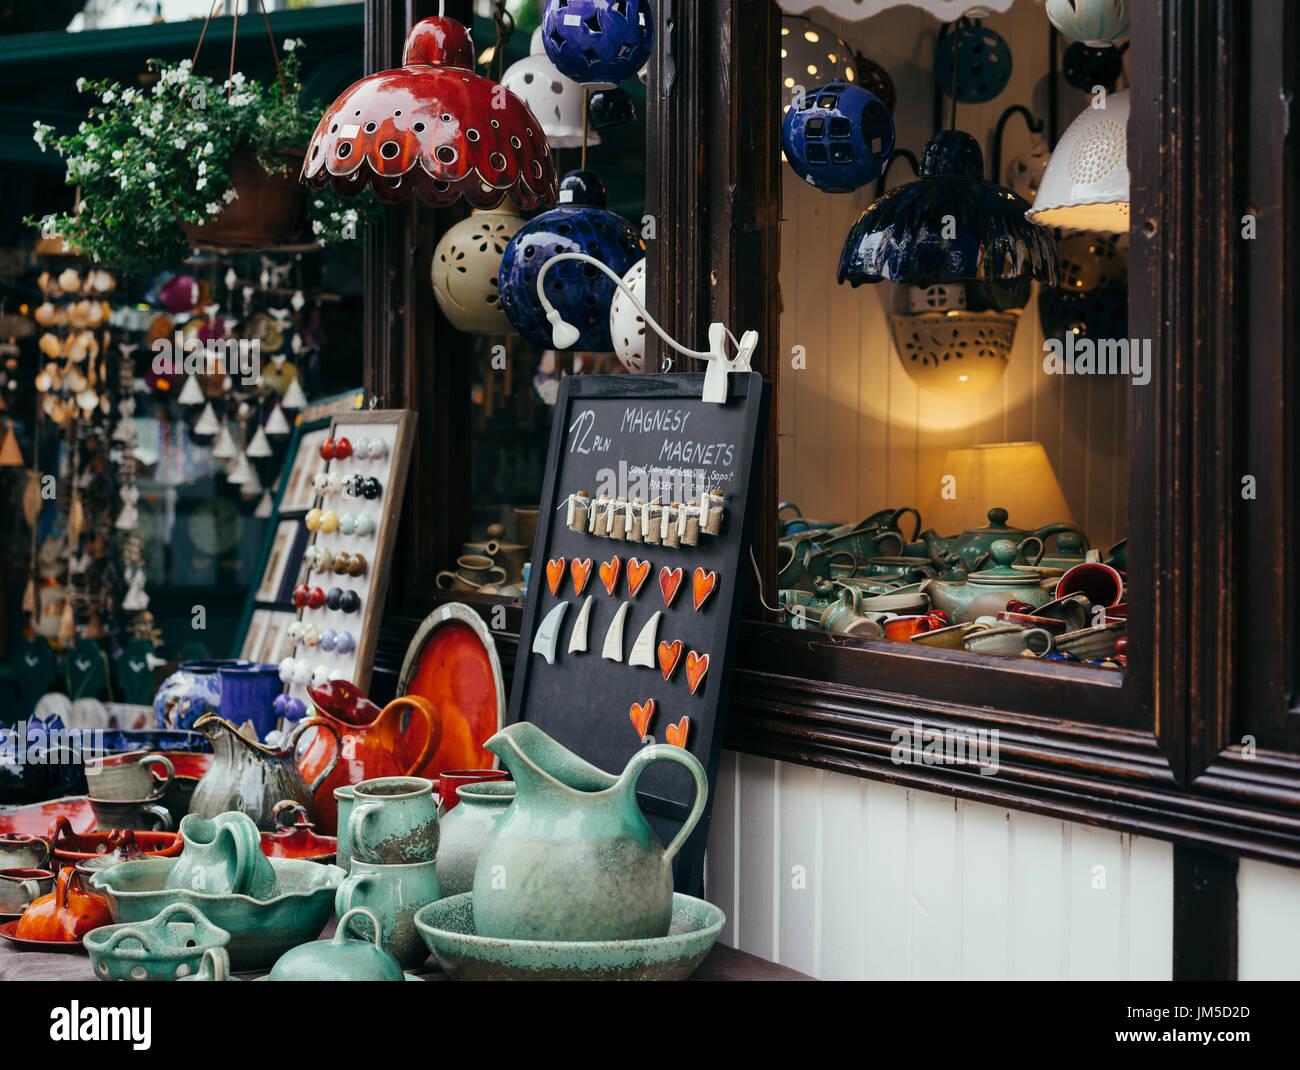 Souvenirs shop showcase in Sopot, Poland  Ceramic gifts Stock Photo